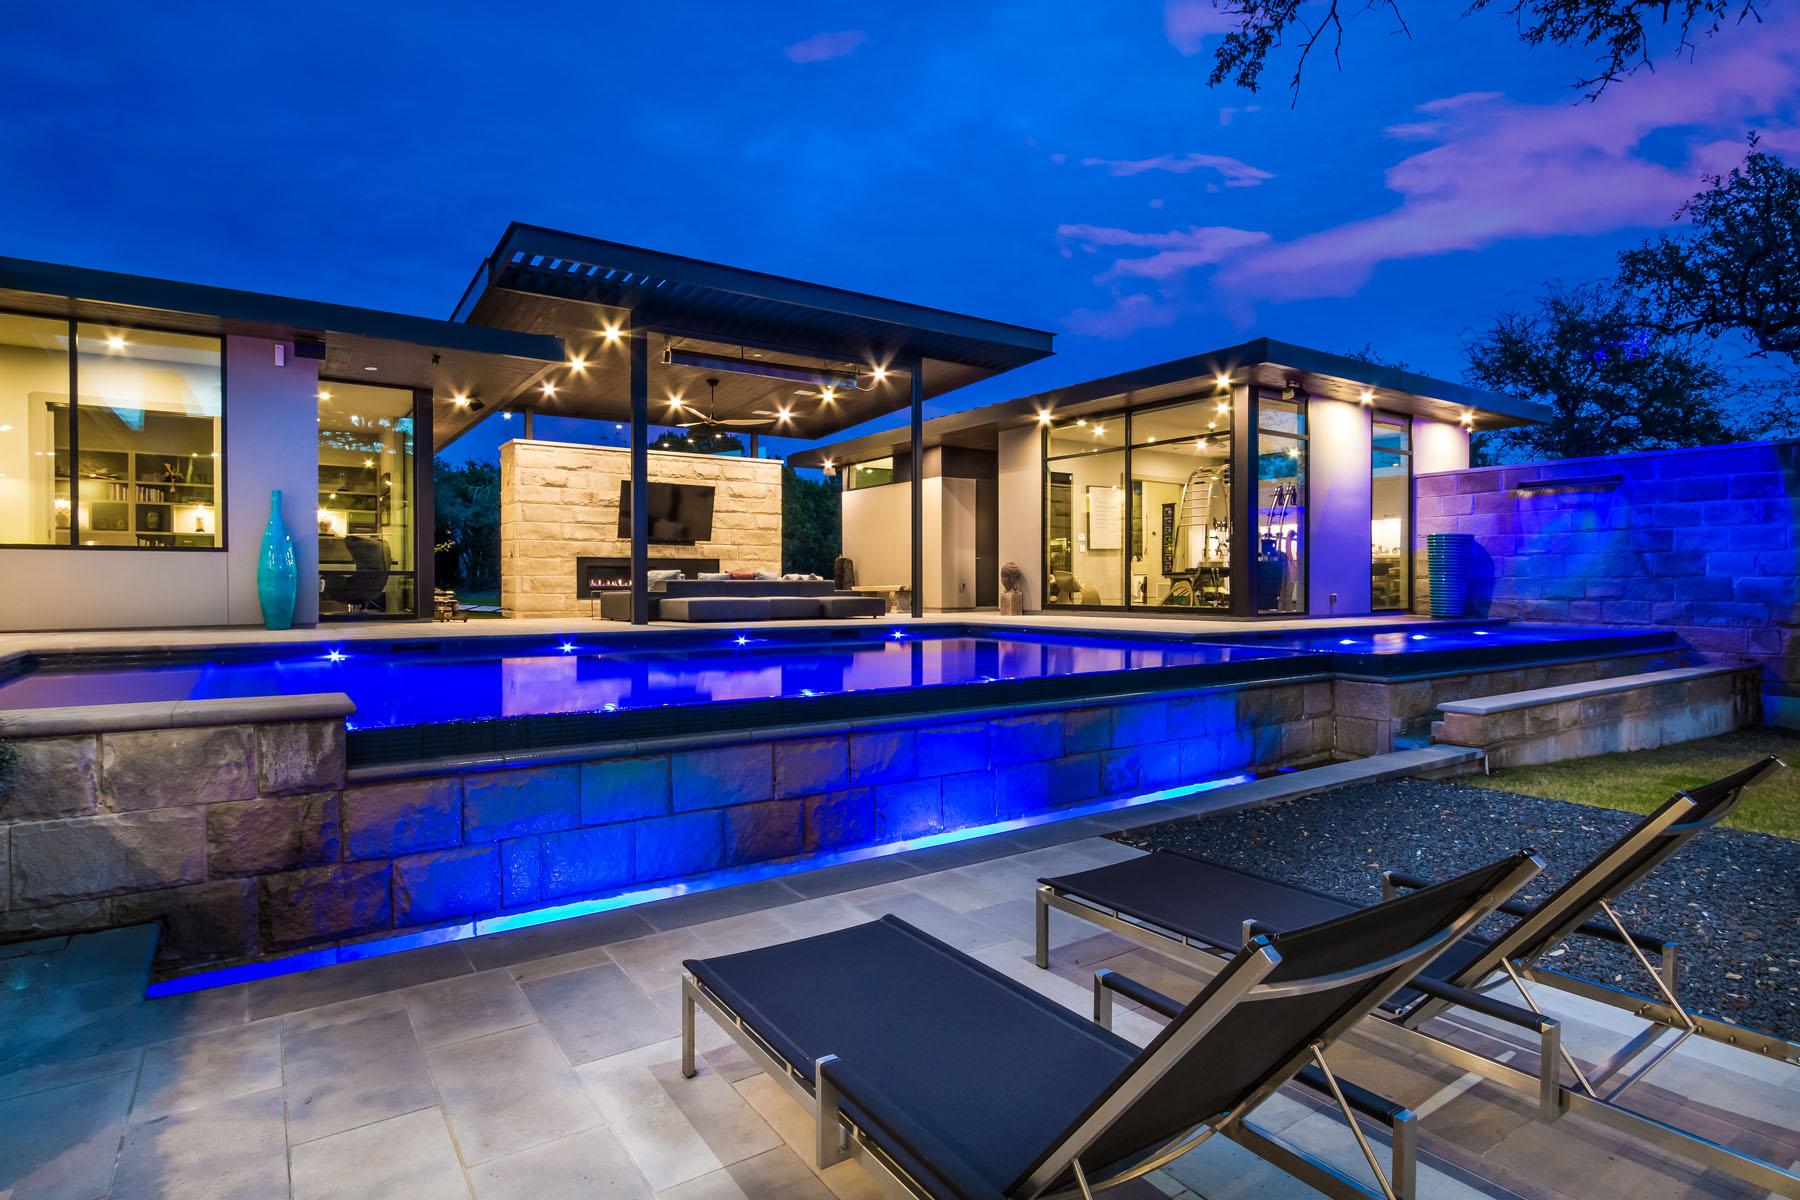 独户住宅 为 销售 在 Tranquil Contemporary in Barton Creek 4017 Verano Dr Barton Creek, 奥斯丁, 得克萨斯州, 78735 美国